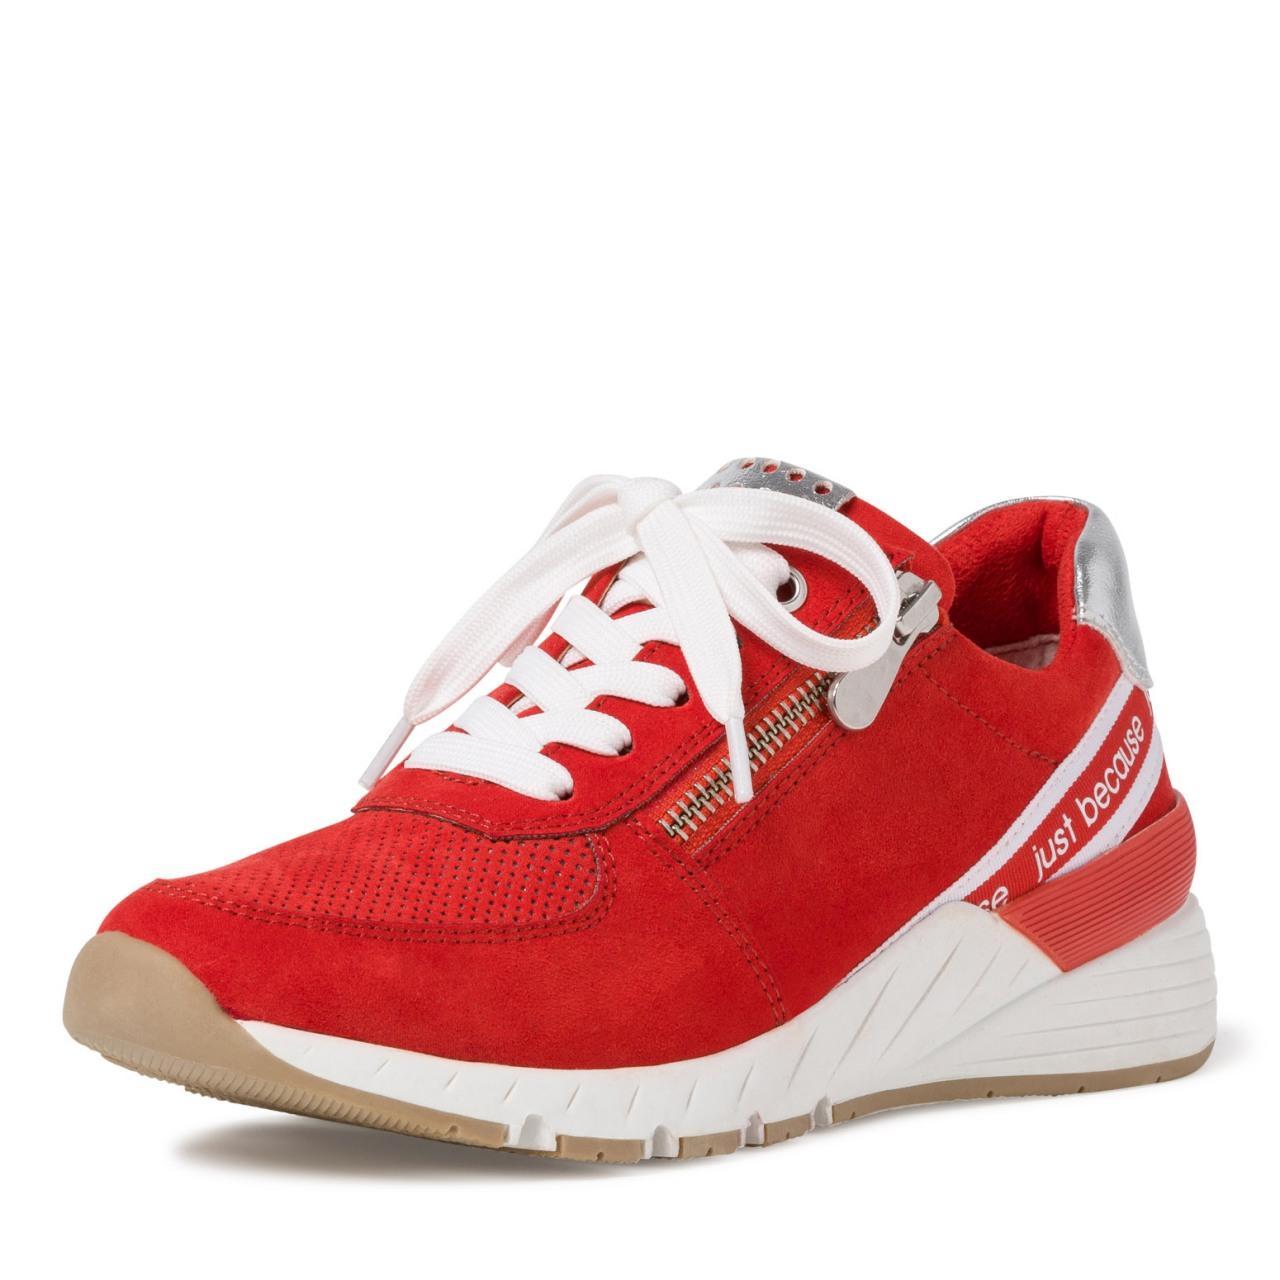 Details zu MARCO TOZZI Premio Fashion Sneaker Schuhe Low Top 2 23739 34 Burn Orange Core